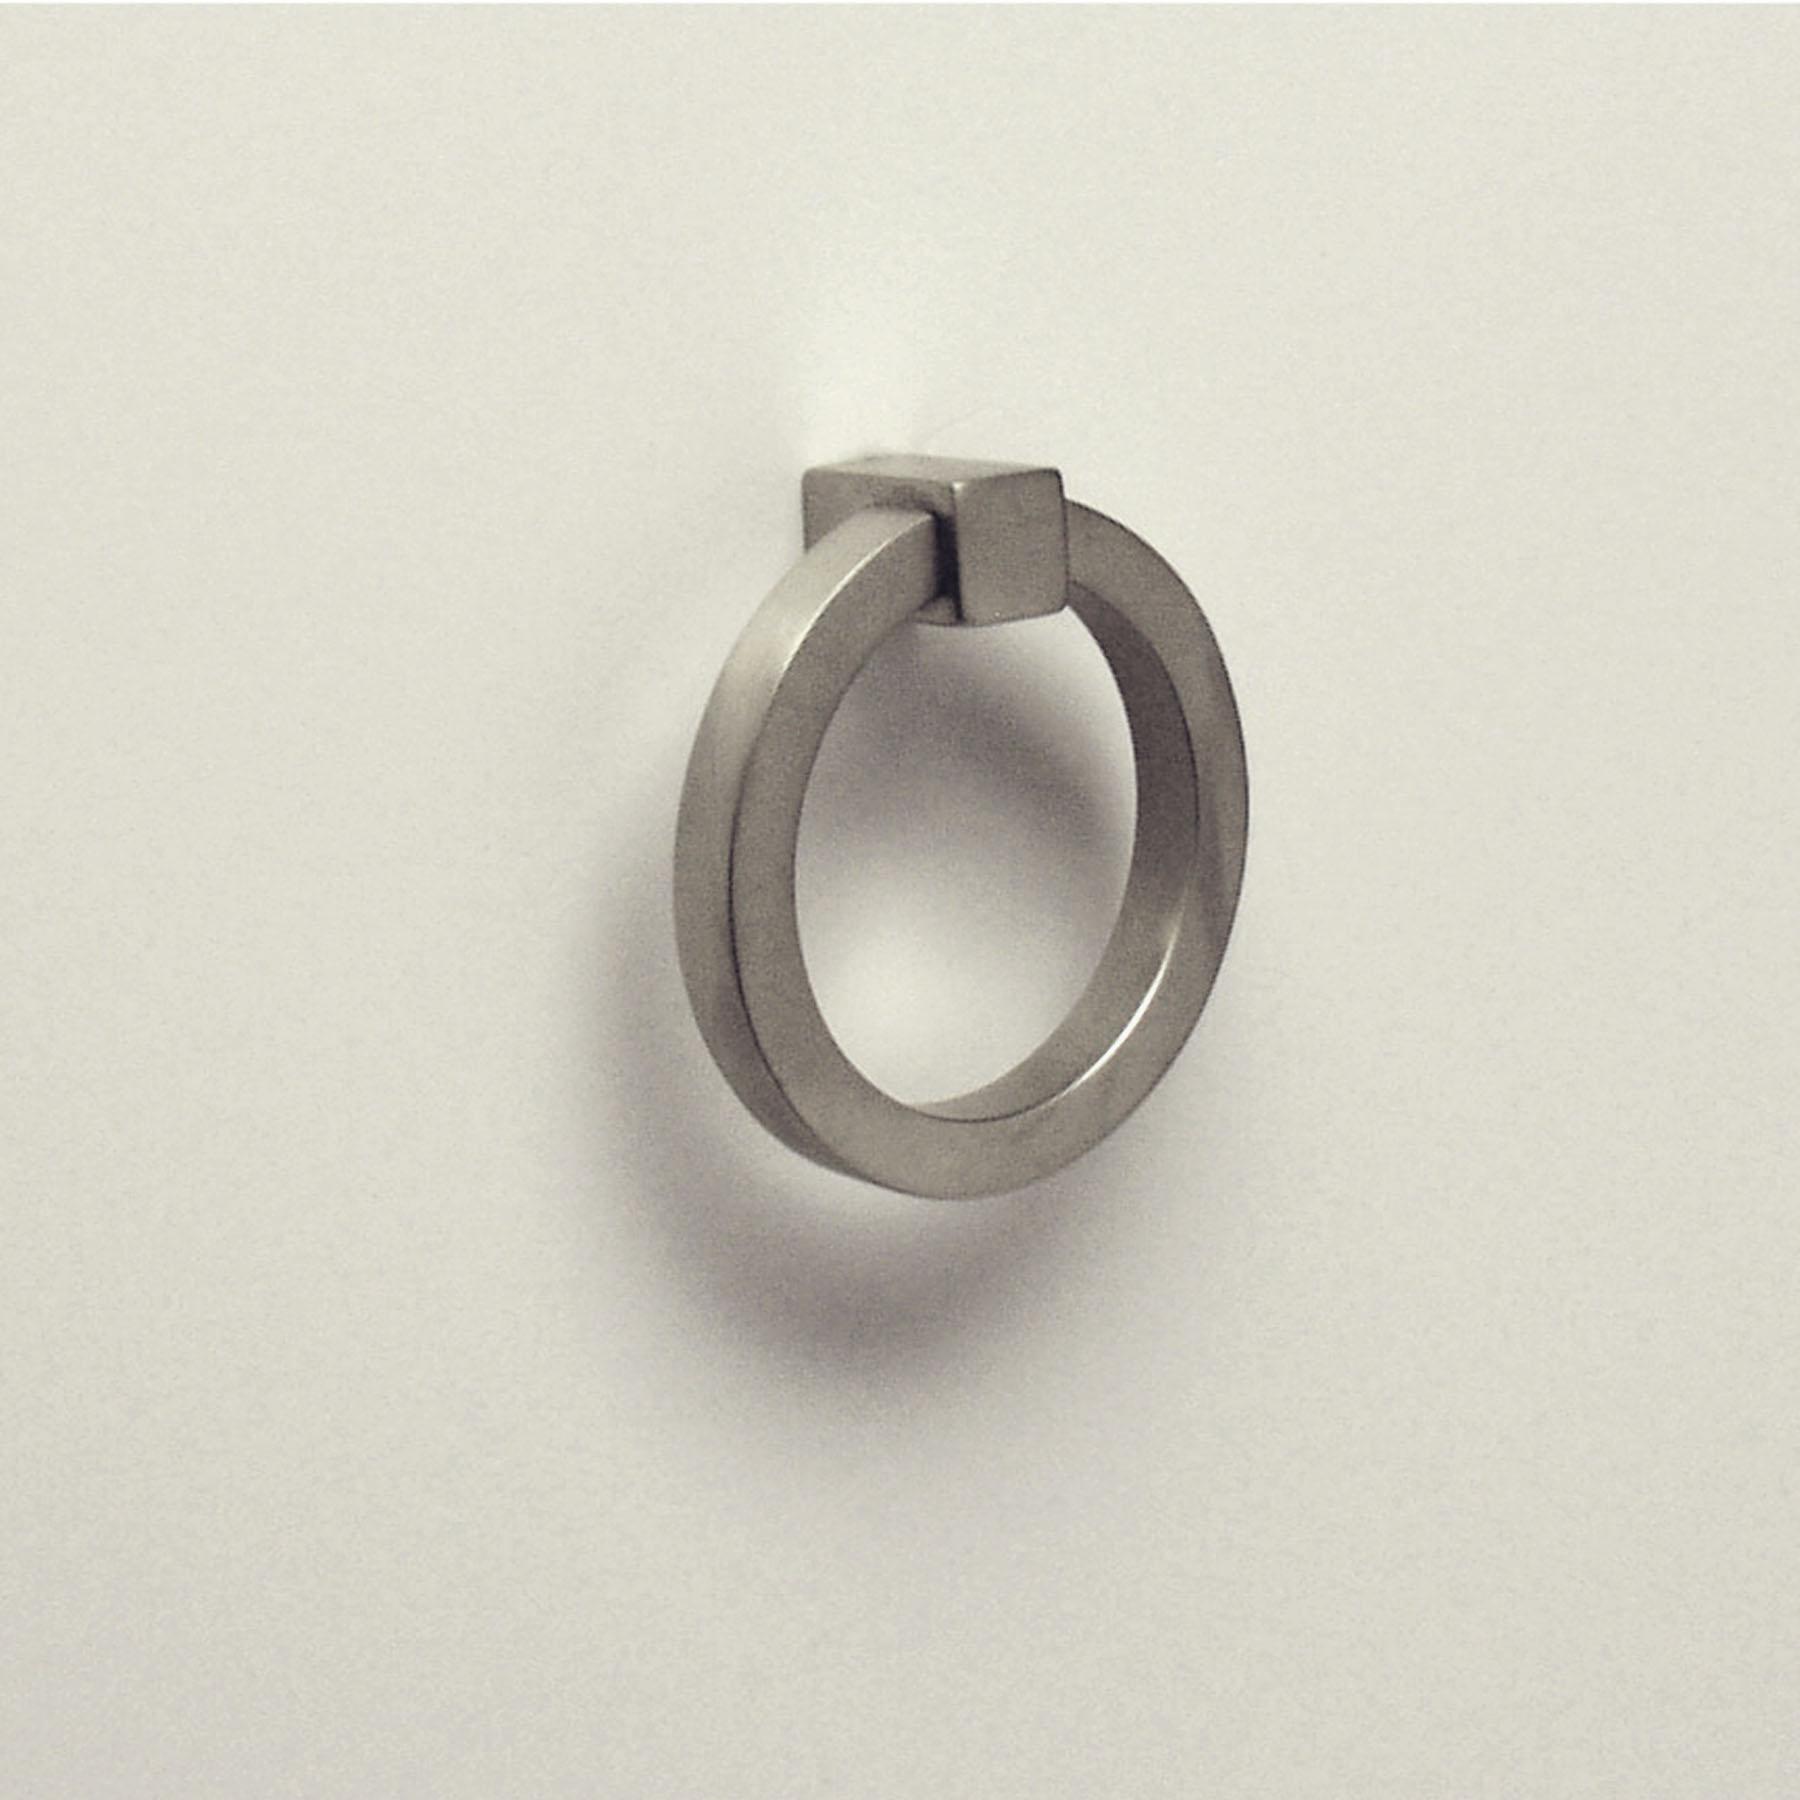 Drop Ring Pull | Decorative Hardware Studio